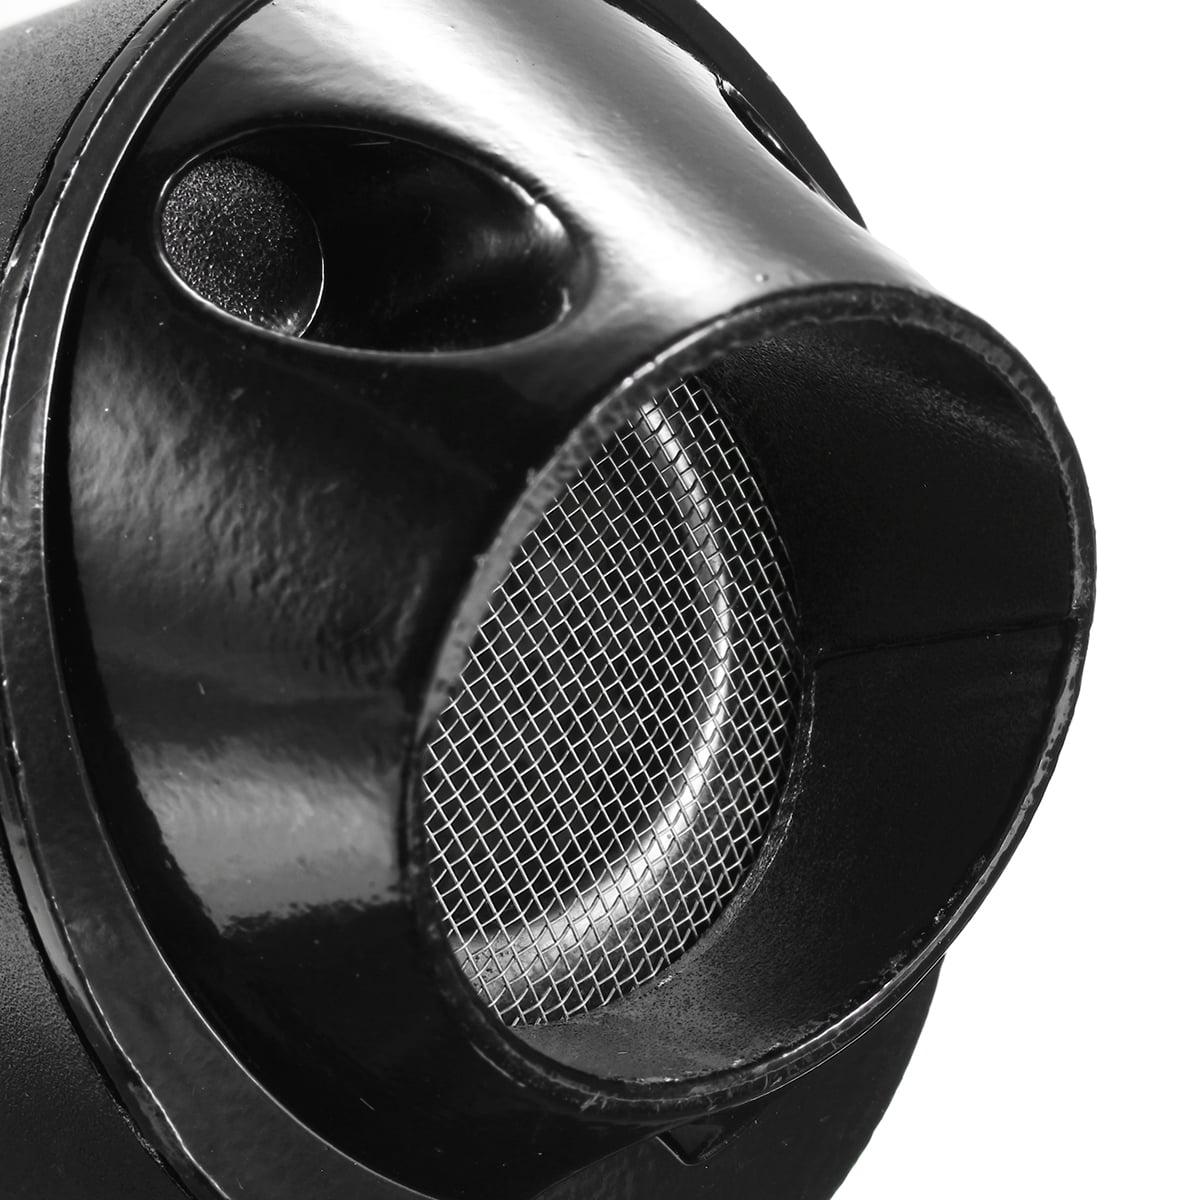 28mm Black Muffler Exhaust Pipe Clamp 50cc 110cc 125cc Dirt Pit Quad Bike ATV